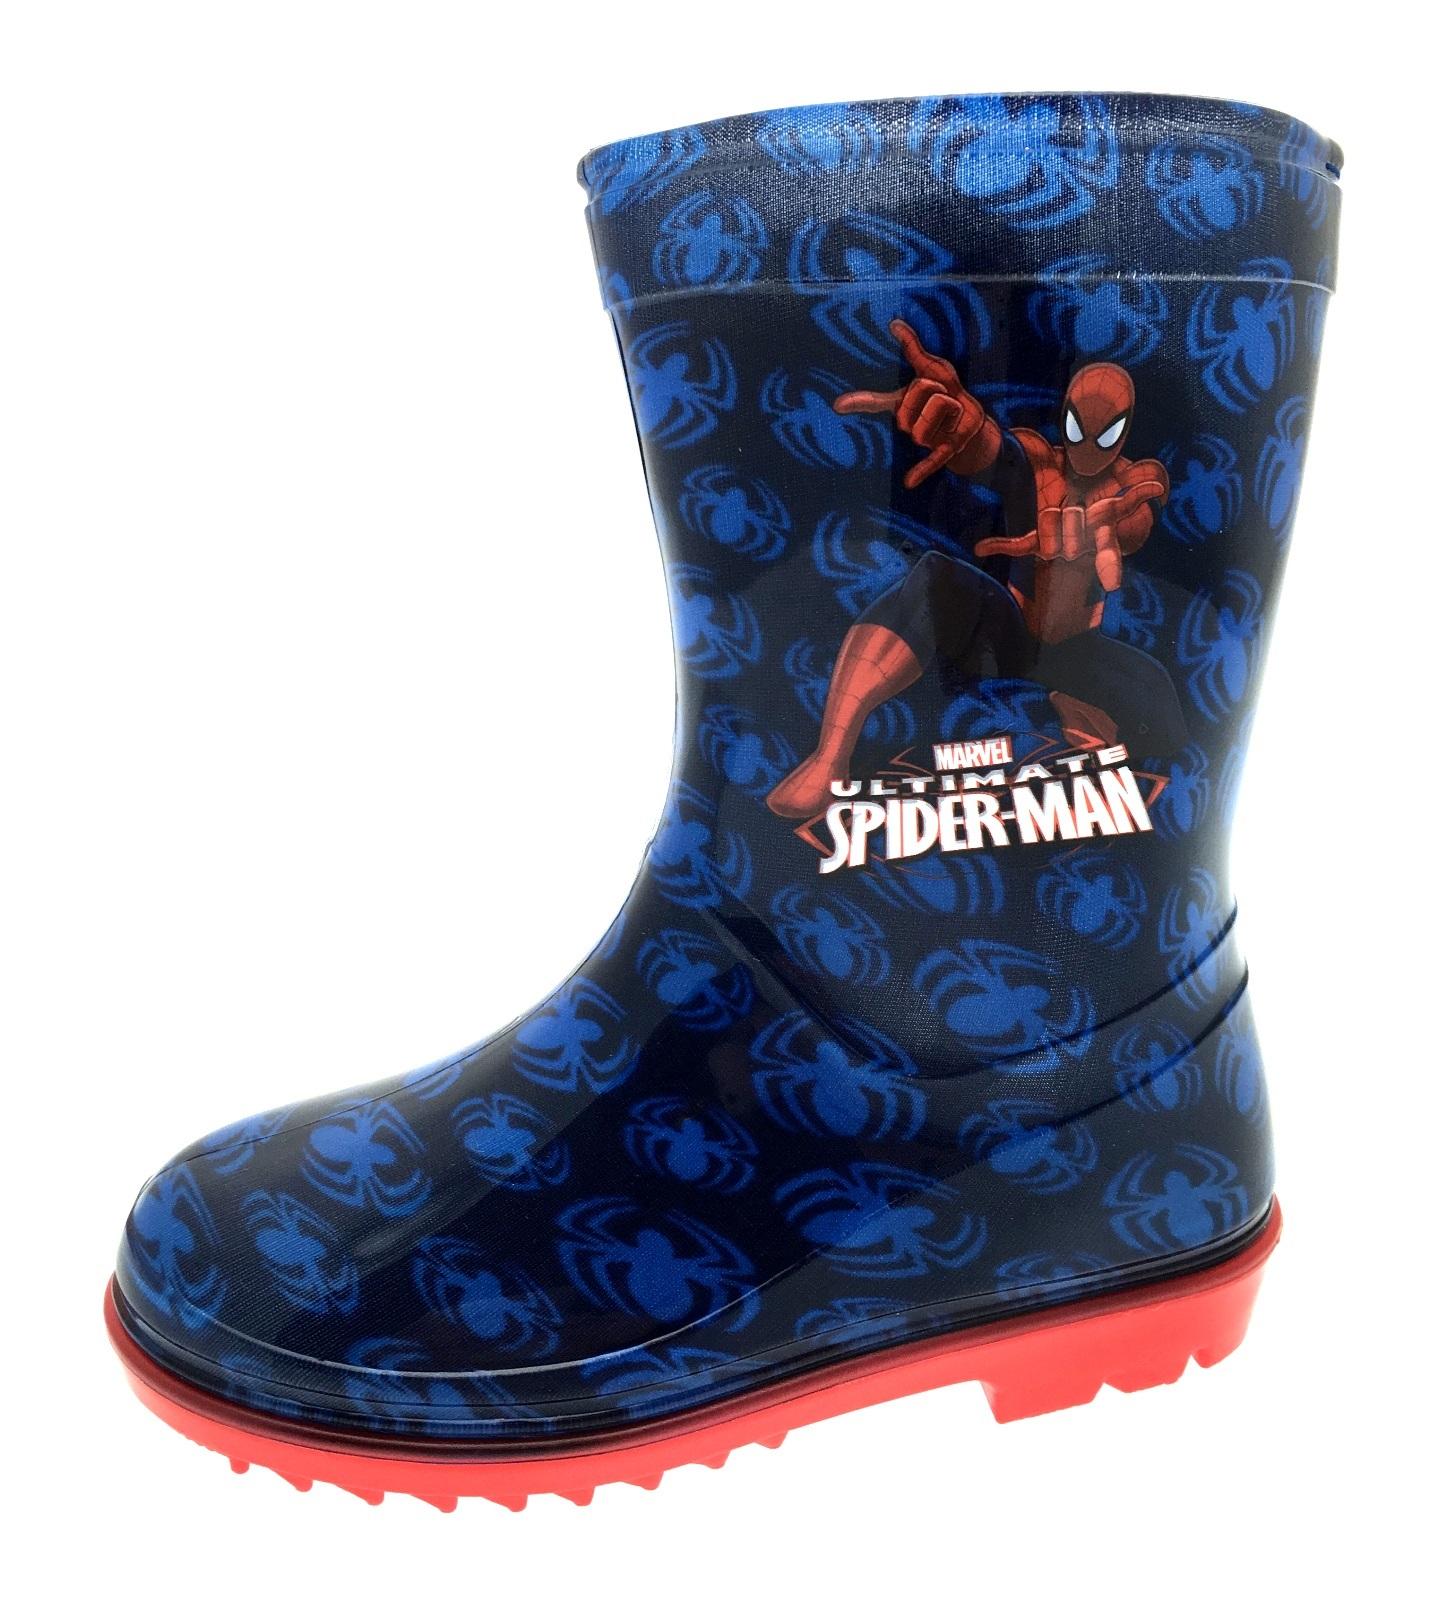 Kids Snow Boots Size 7